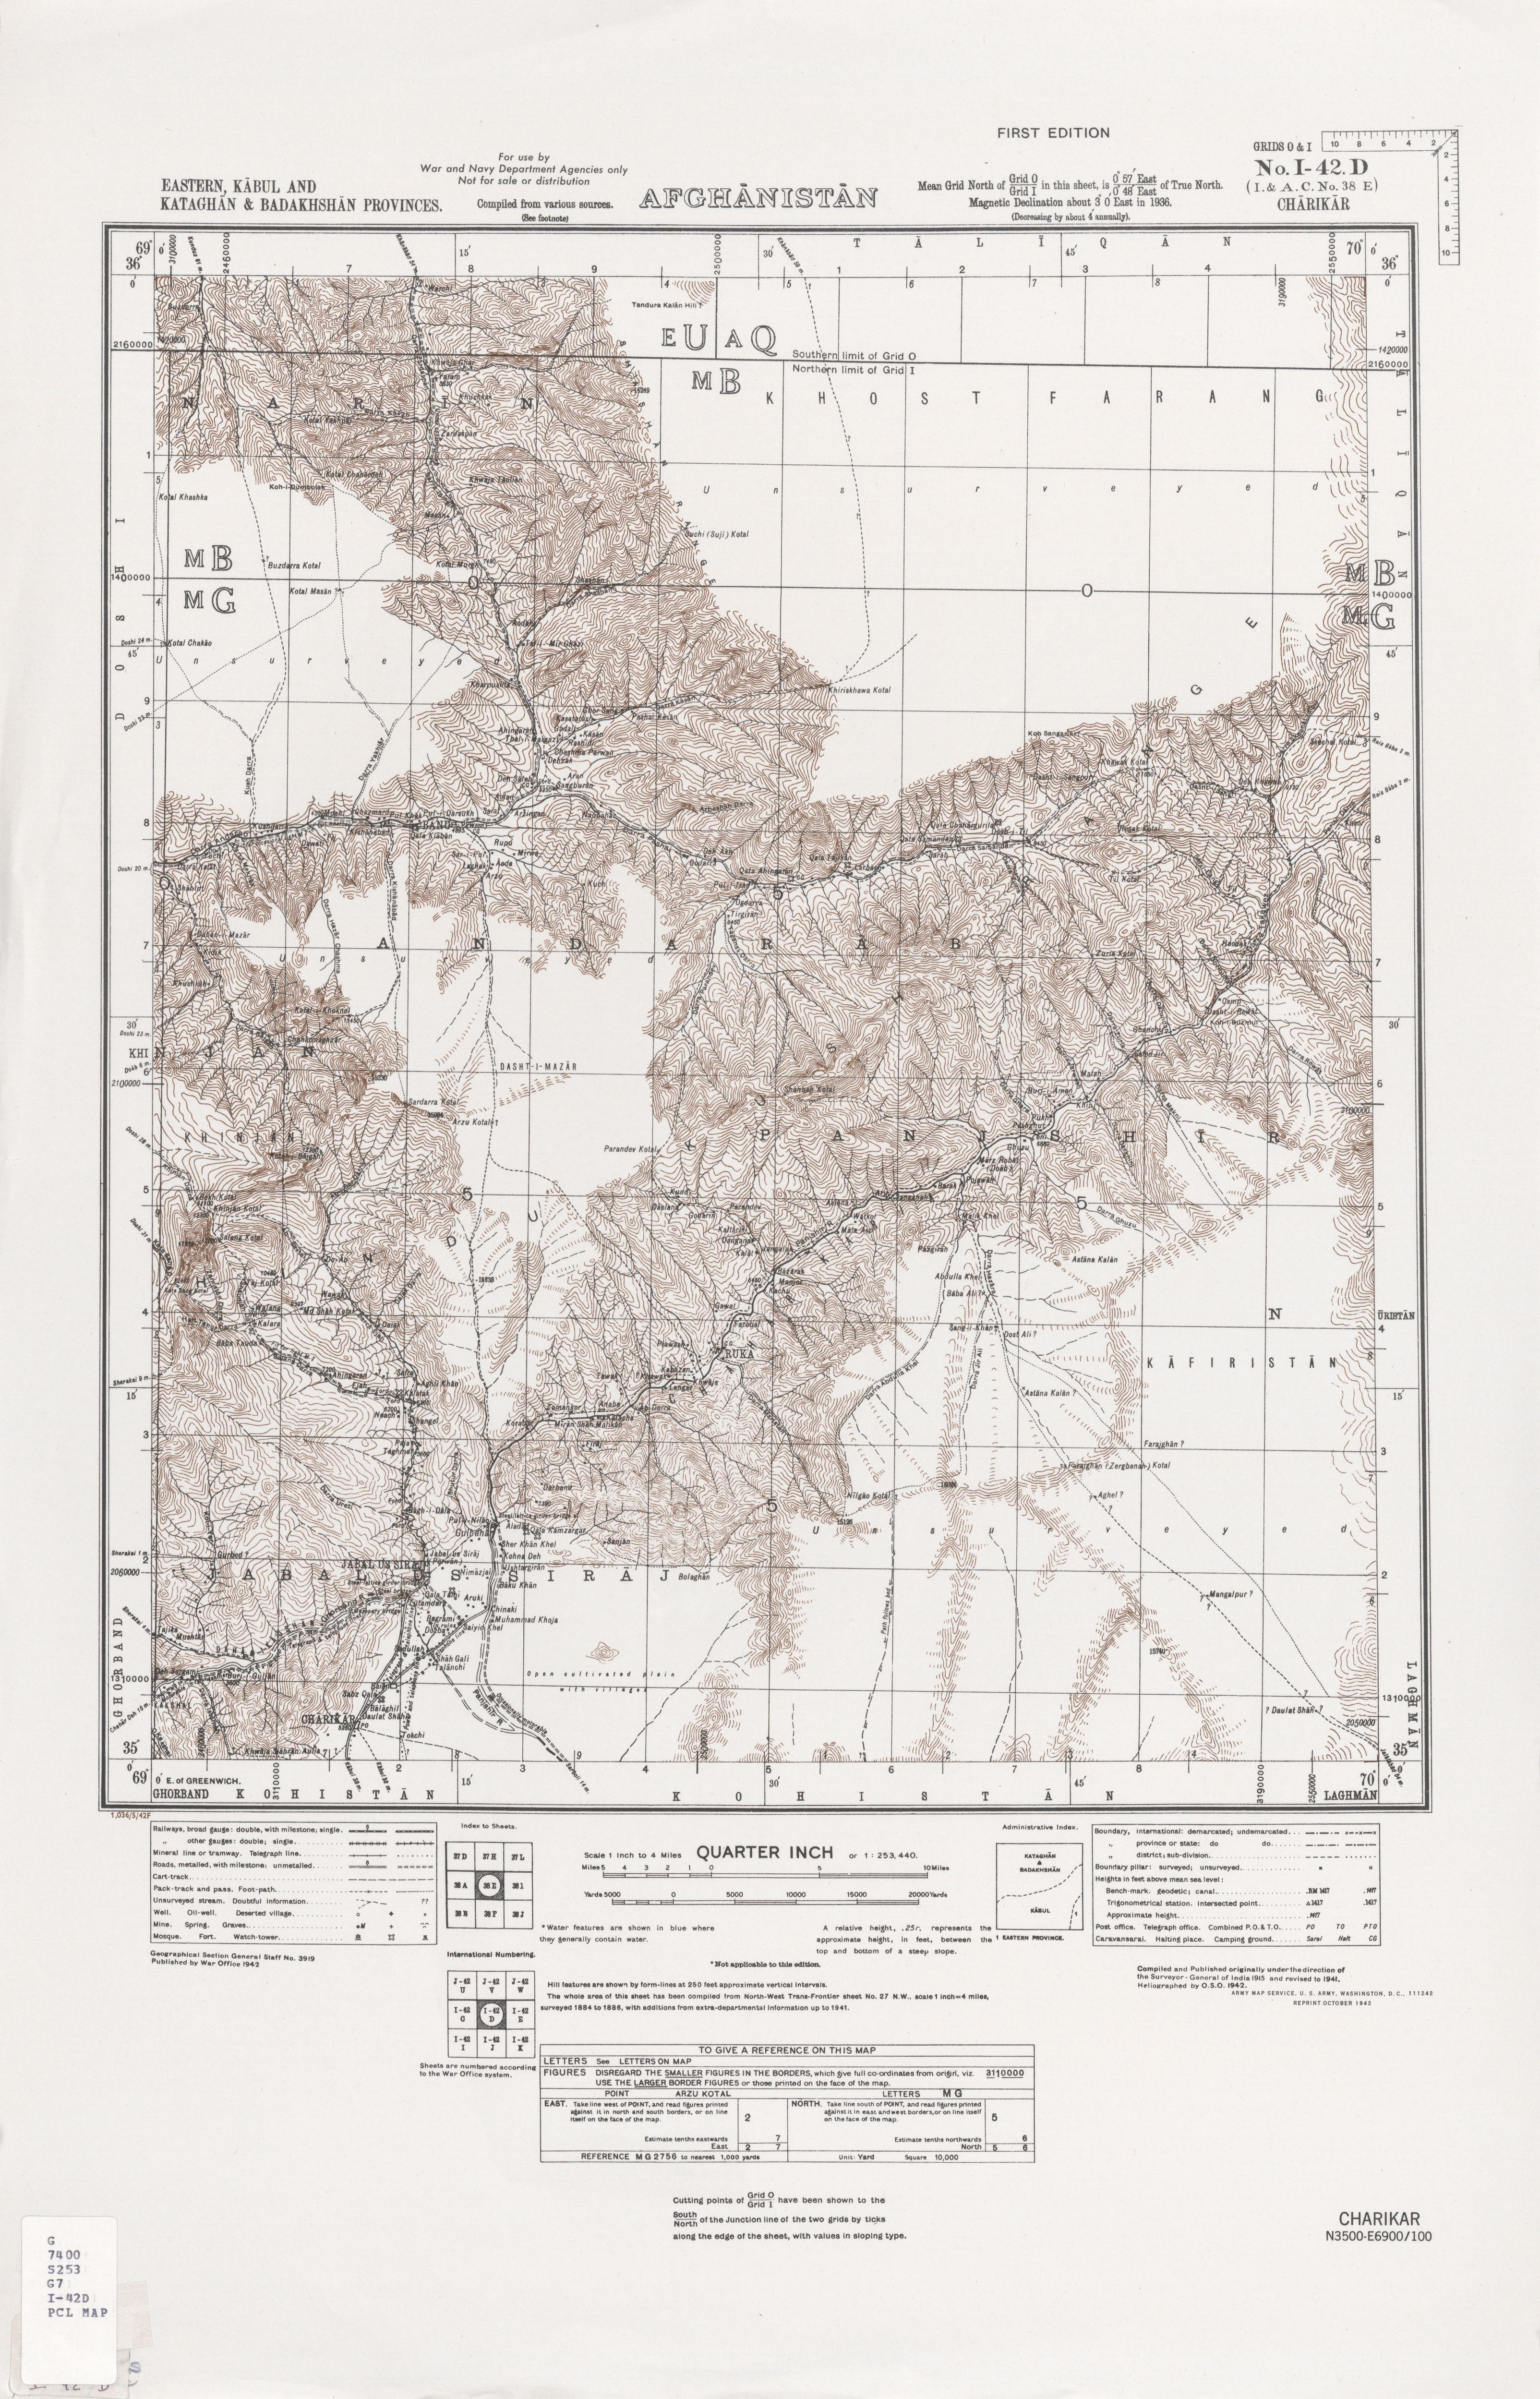 Iraq Iran AMS Topographic Maps PerryCastañeda Map Collection - Charikar map